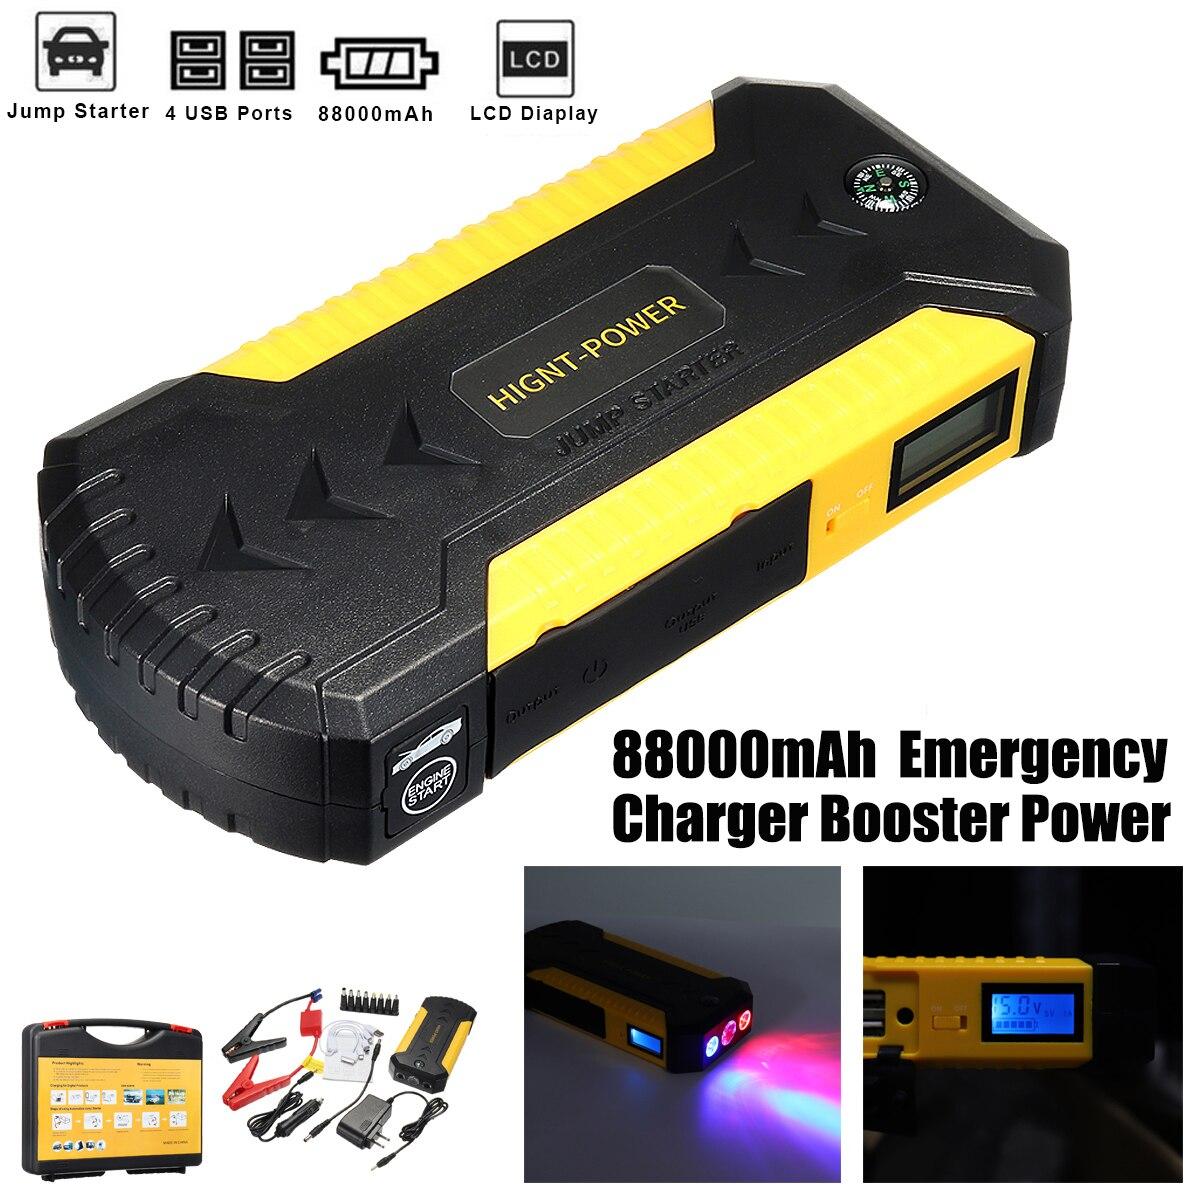 все цены на 88000mAh 4USB 12V Car Jump Starter Emergency Charger Booster Power Bank Battery Jump Starter Tool Set for Auto Starting Device онлайн